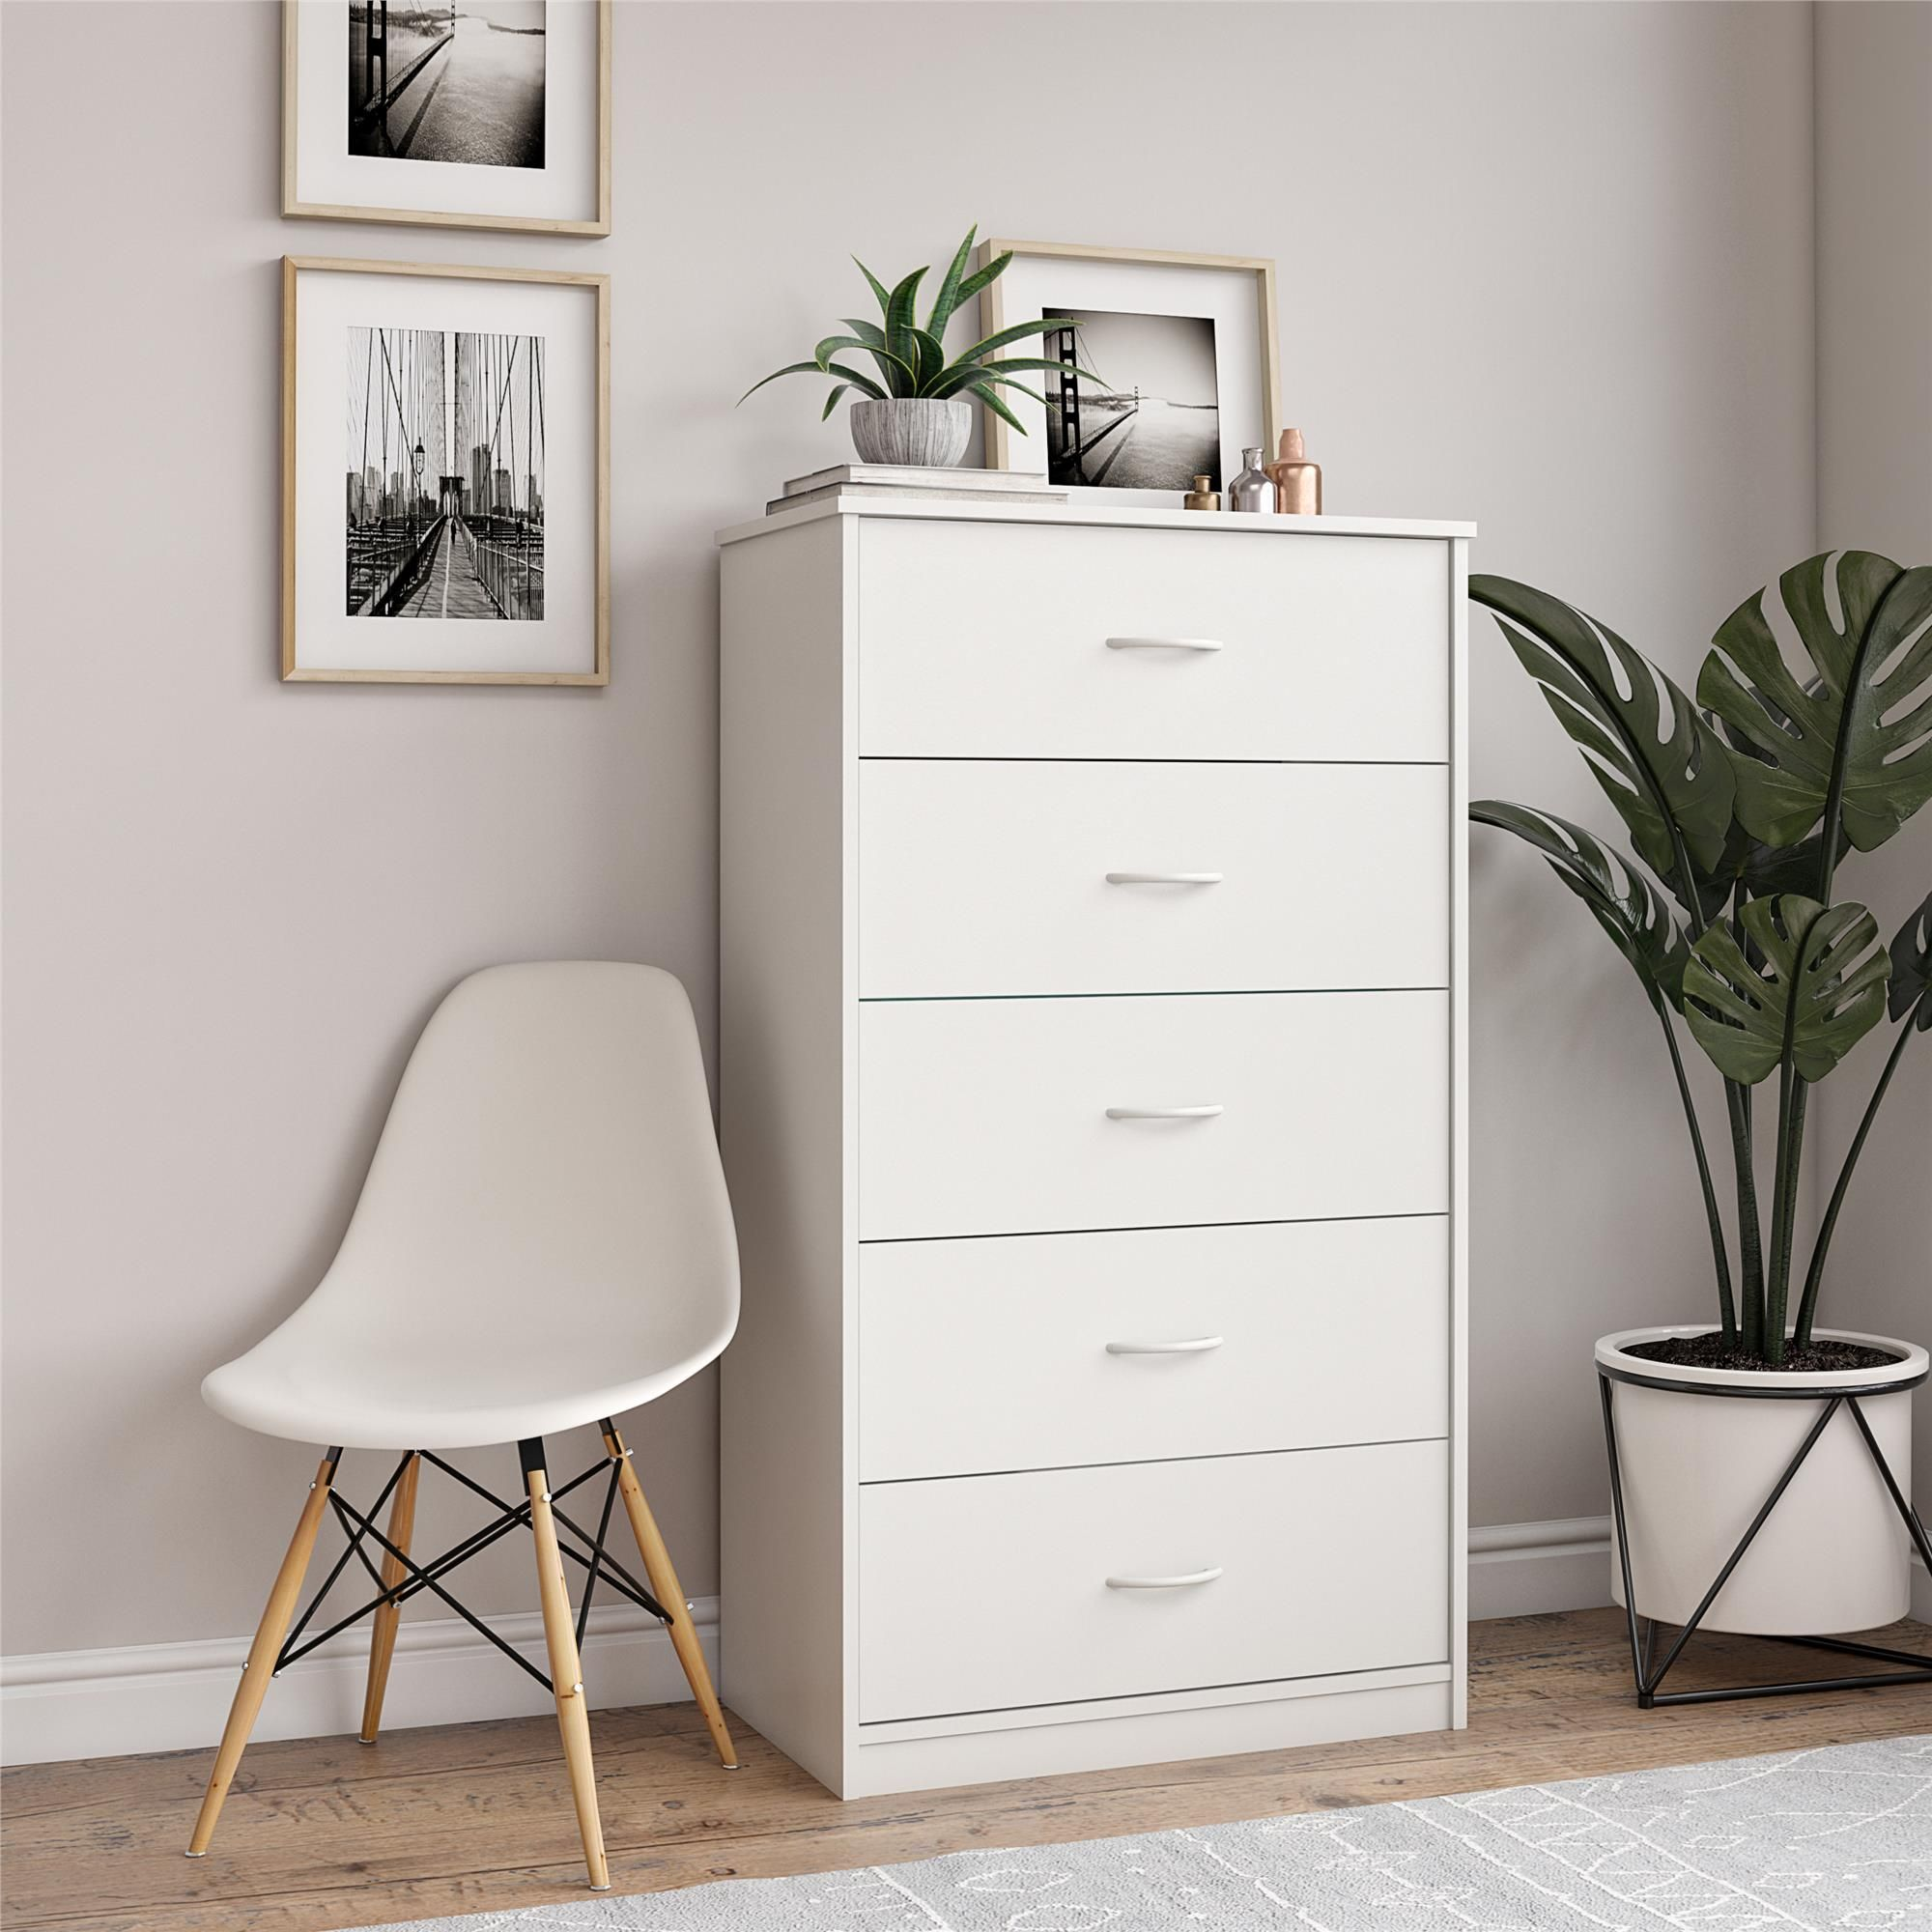 Mainstays Classic 5 Drawer Dresser White Finish Walmart Com In 2020 5 Drawer Dresser Clothes Cabinet Bedroom Dresser Drawers